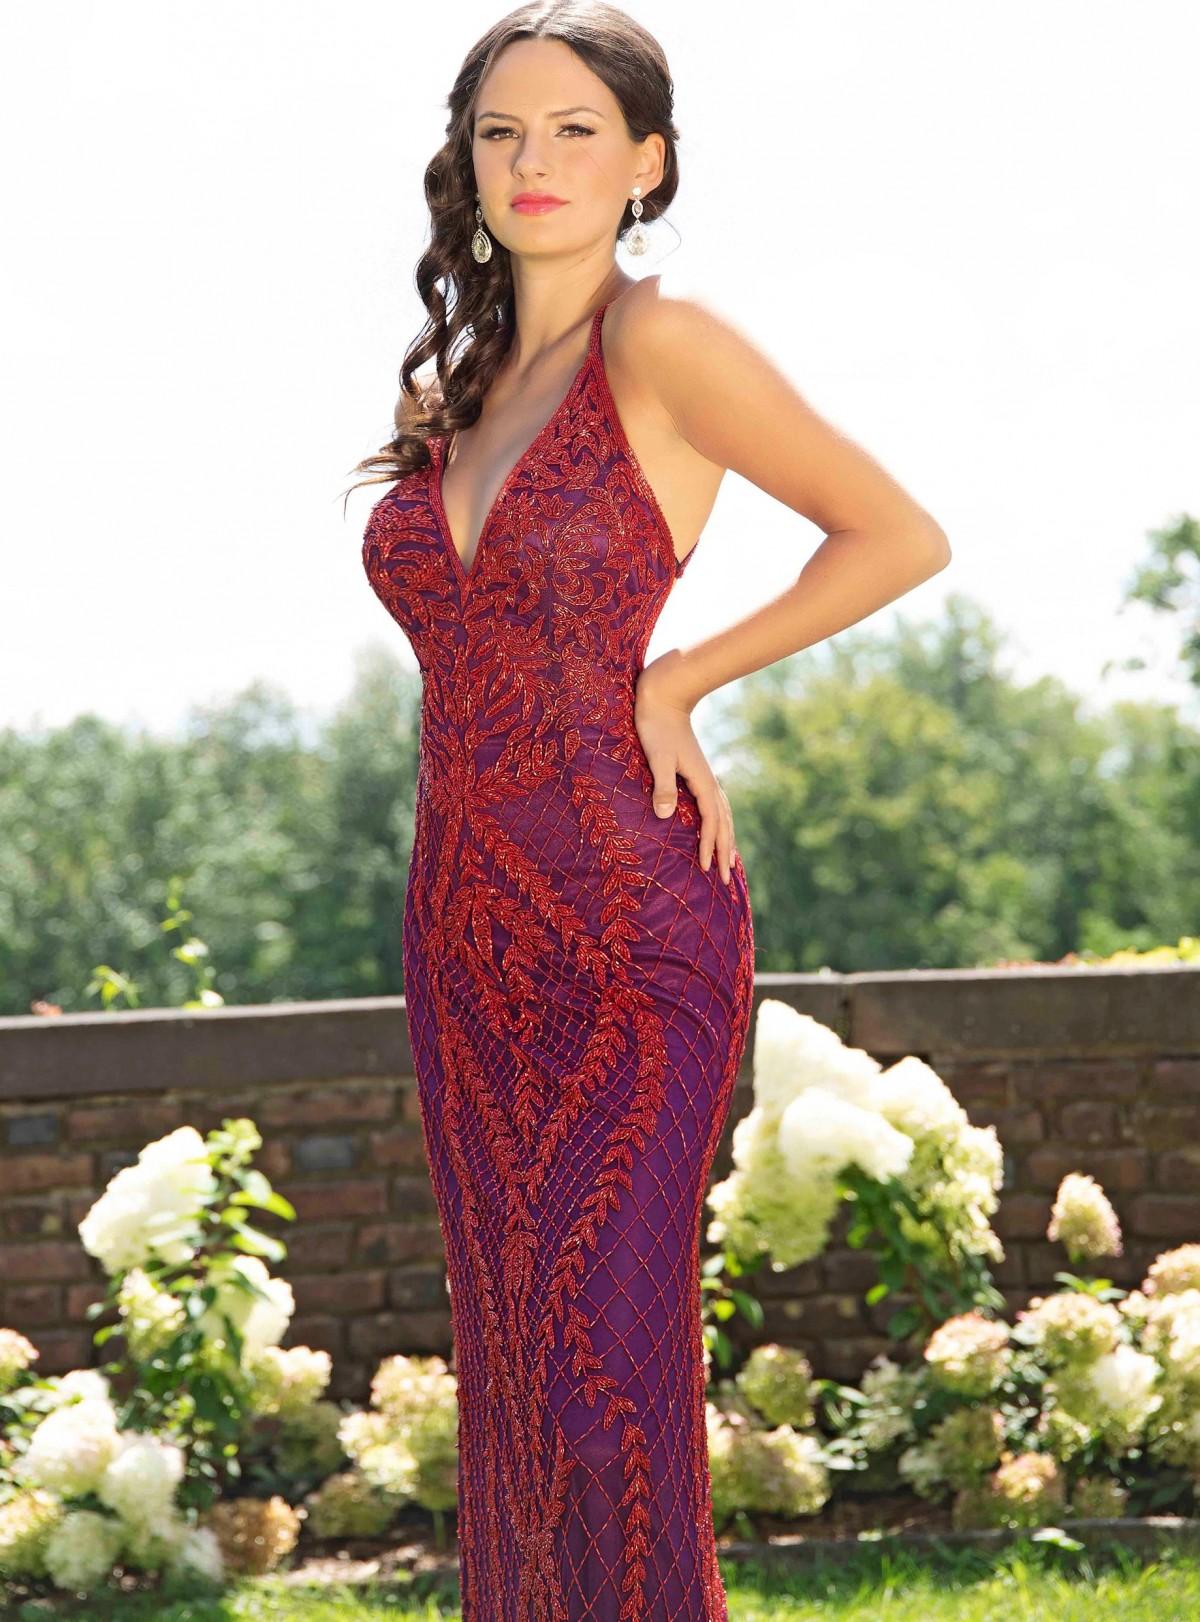 Primavera Couture beaded dress